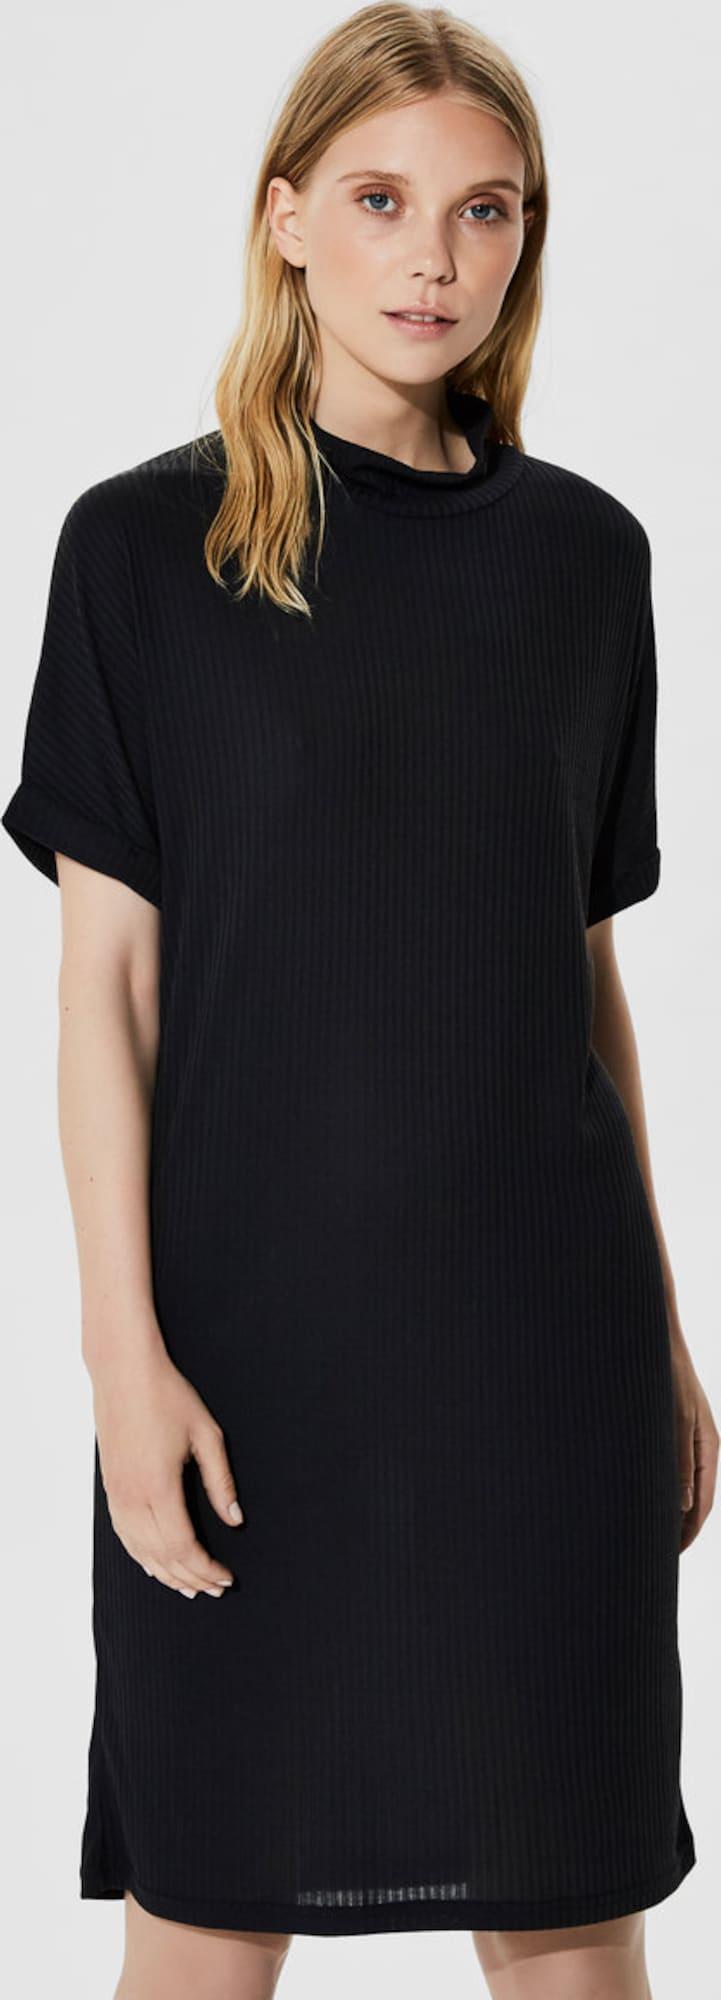 selected femme modalmix kleid mit kurzen rmeln in schwarz. Black Bedroom Furniture Sets. Home Design Ideas